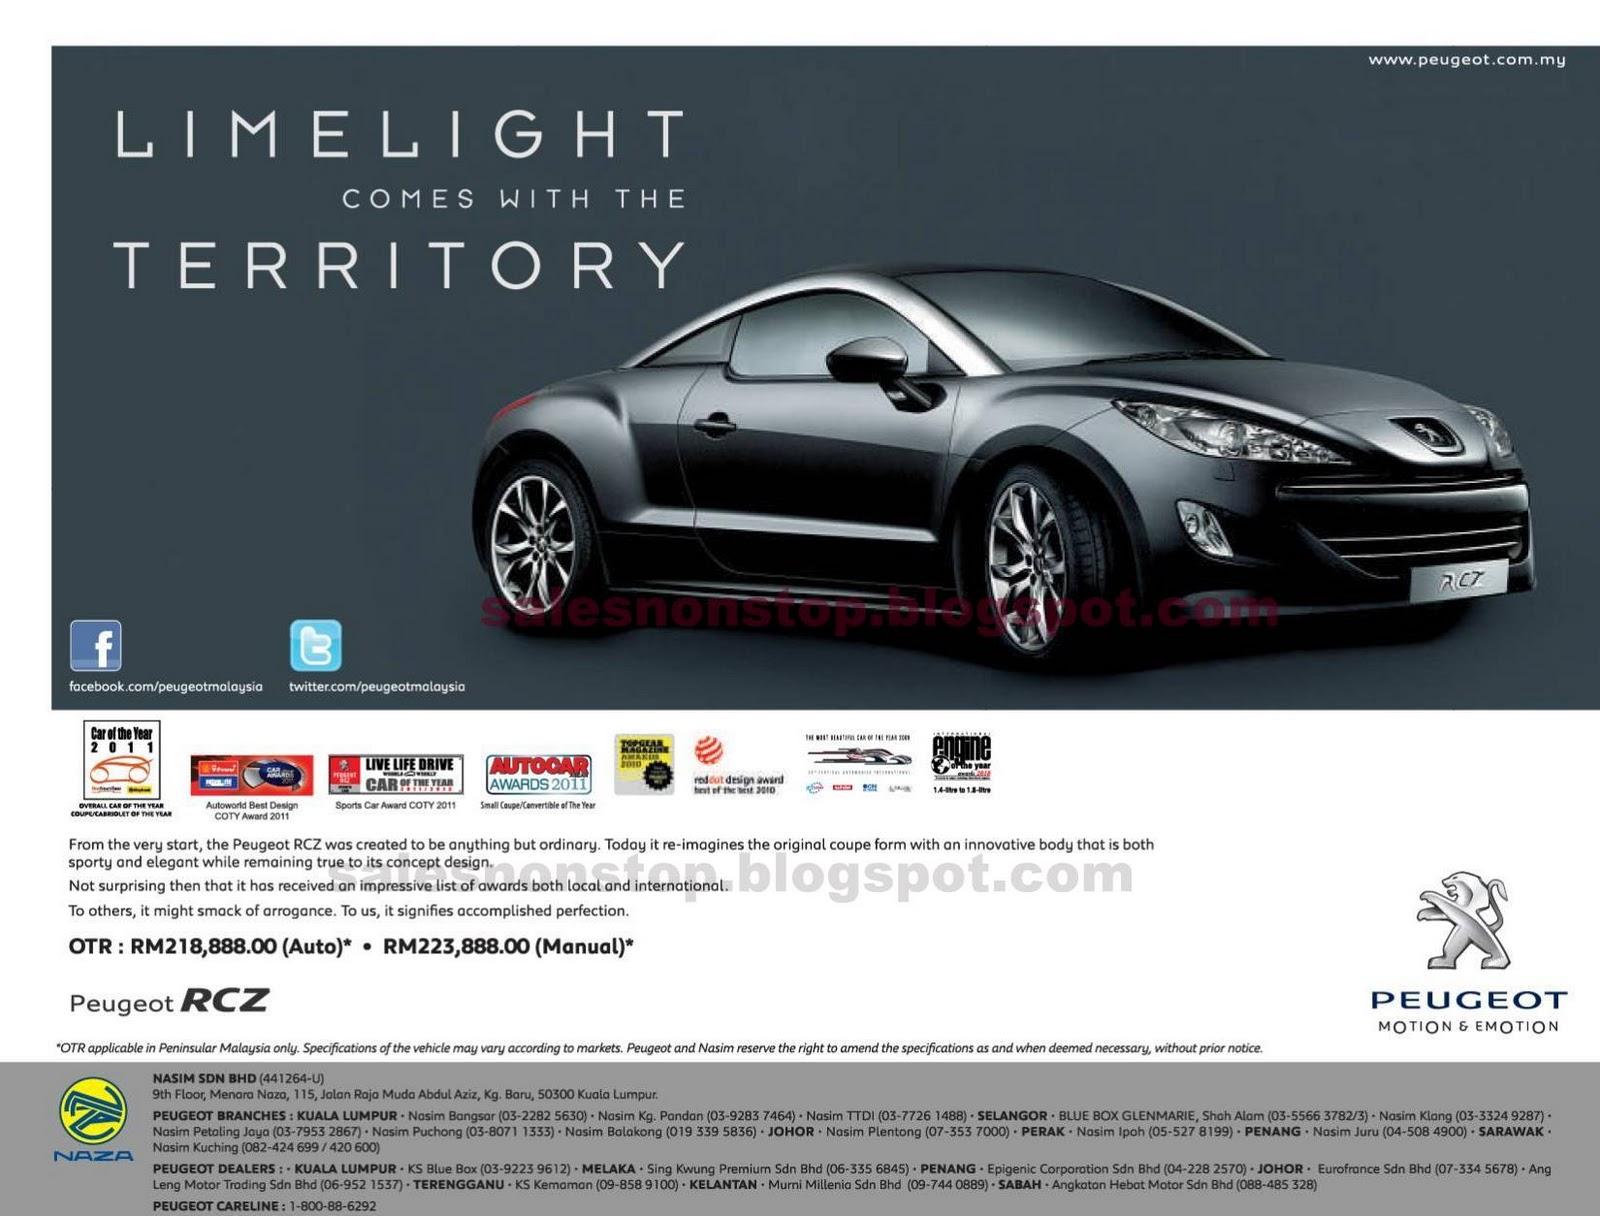 peugeot rcz - otr price in malaysia | sales nonstop